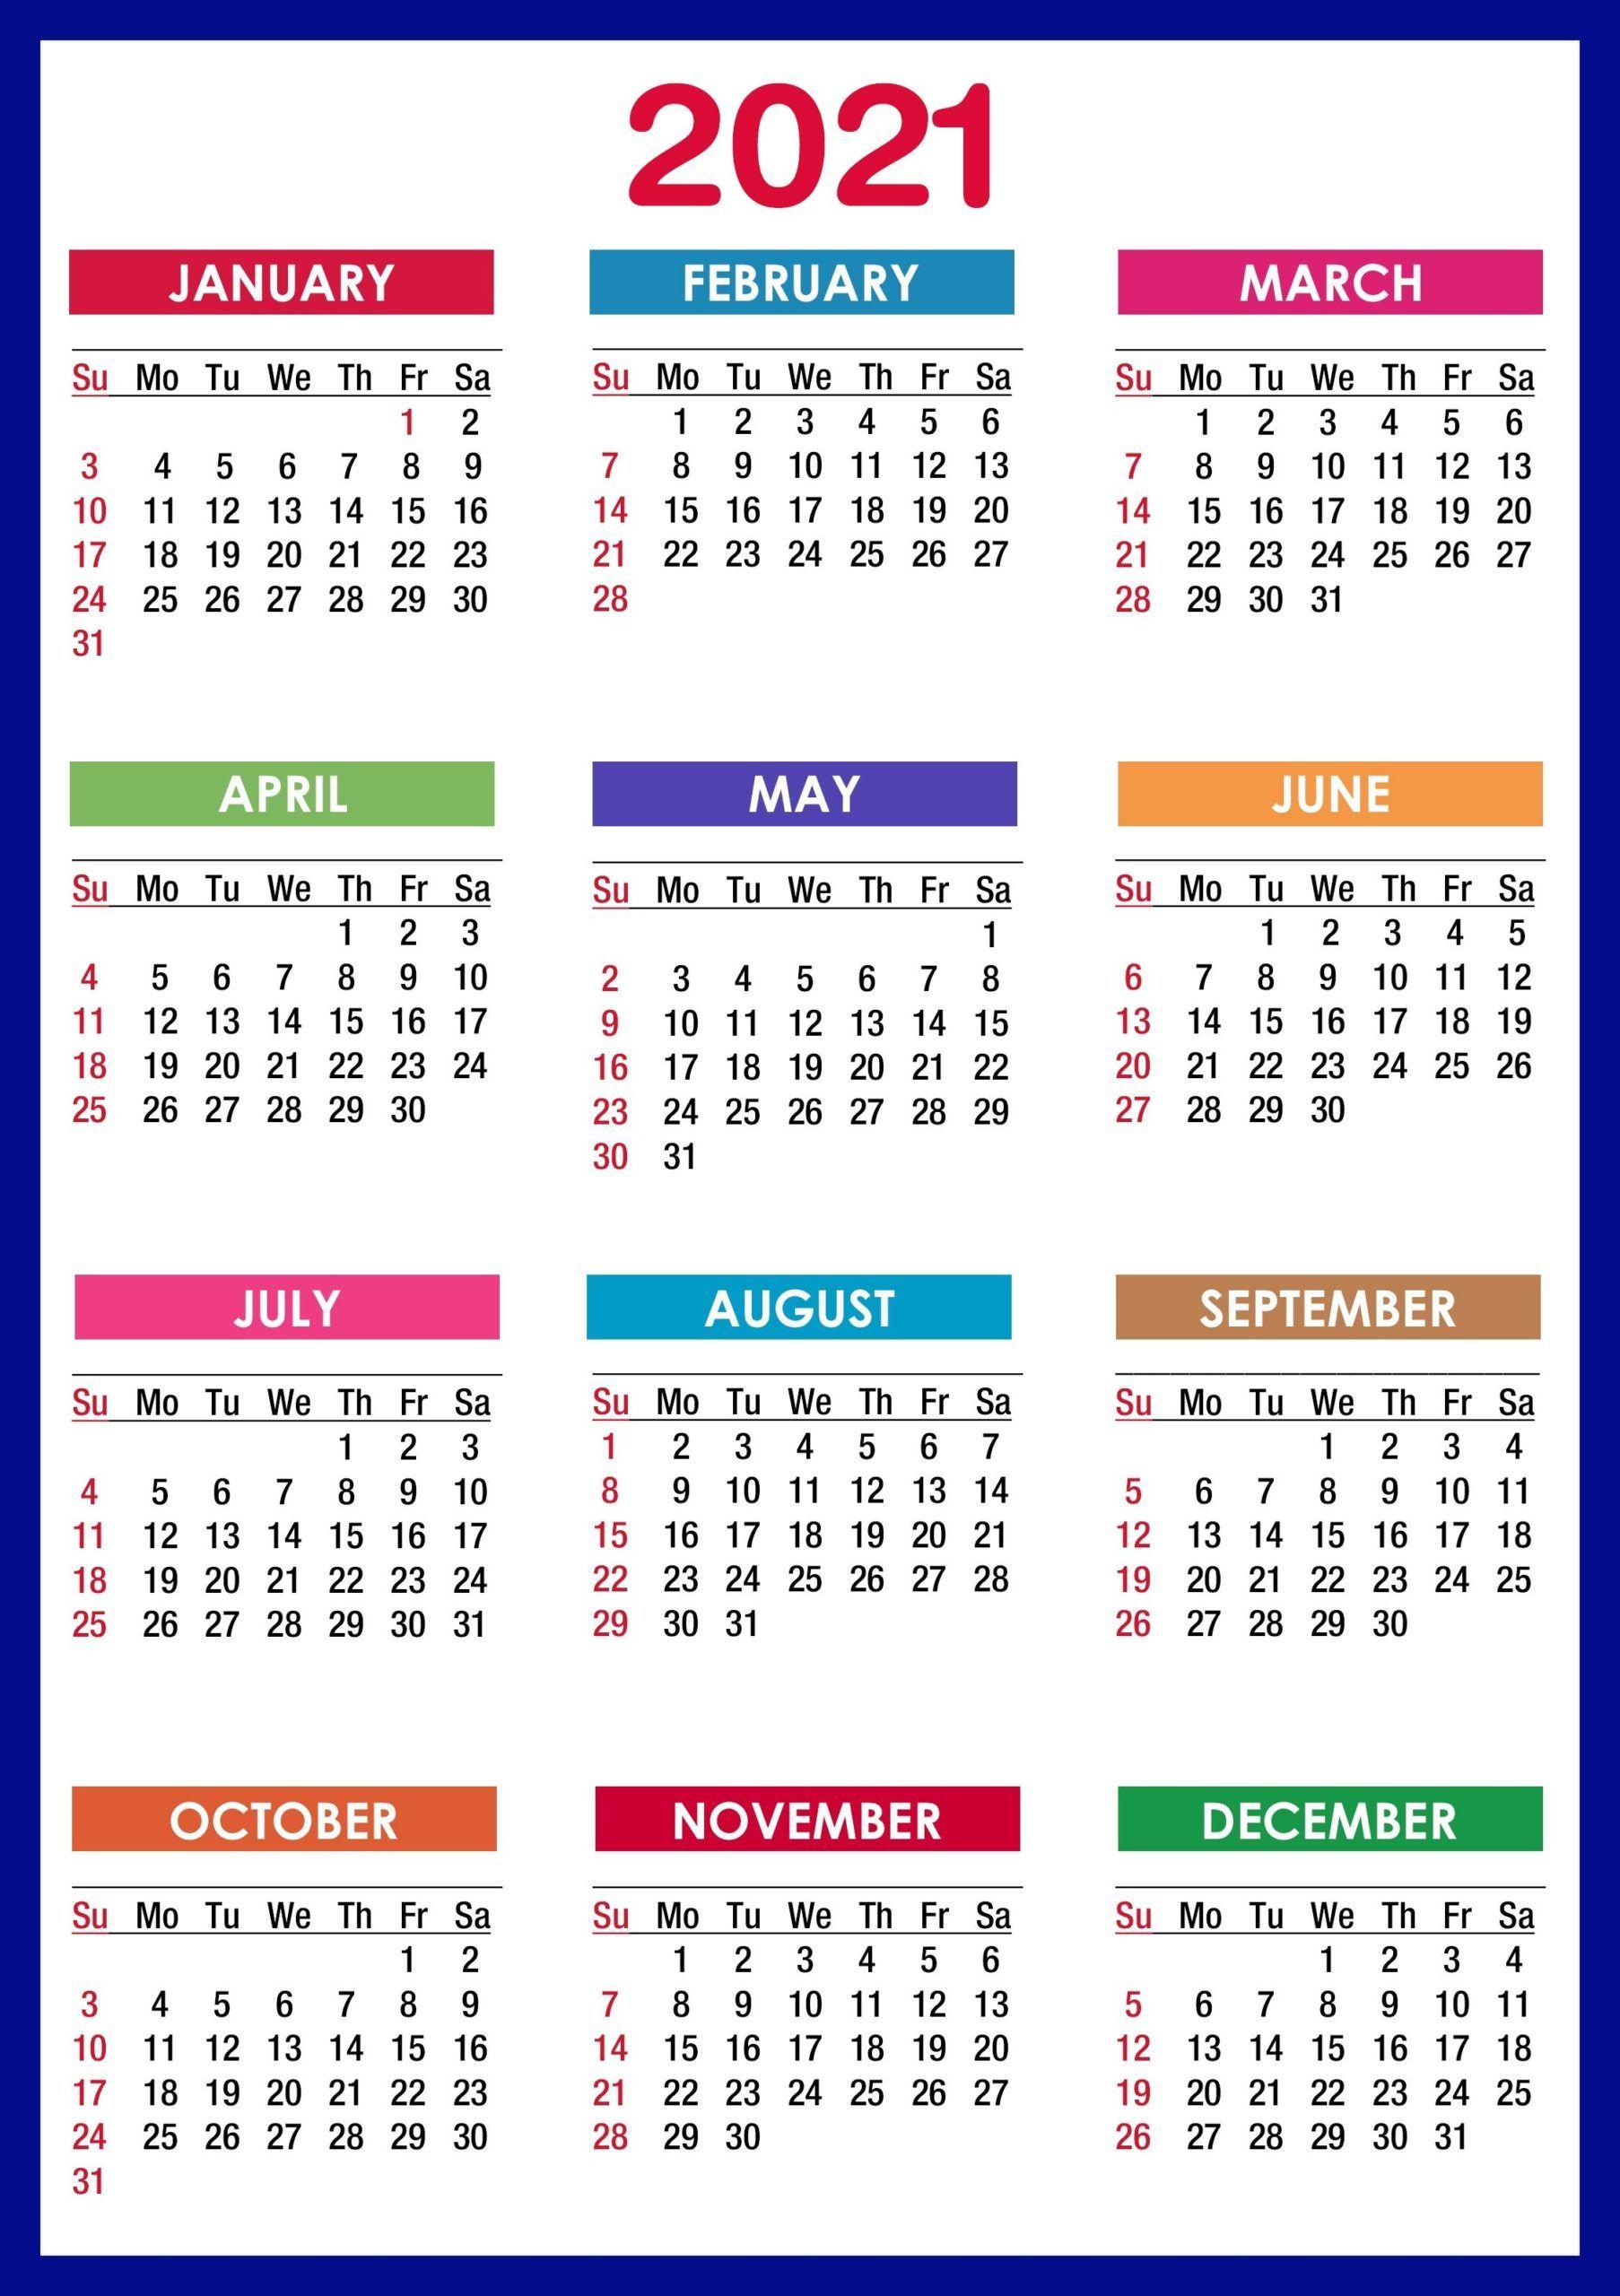 2021 Calendar Printable   12 Months All In One   Calendar